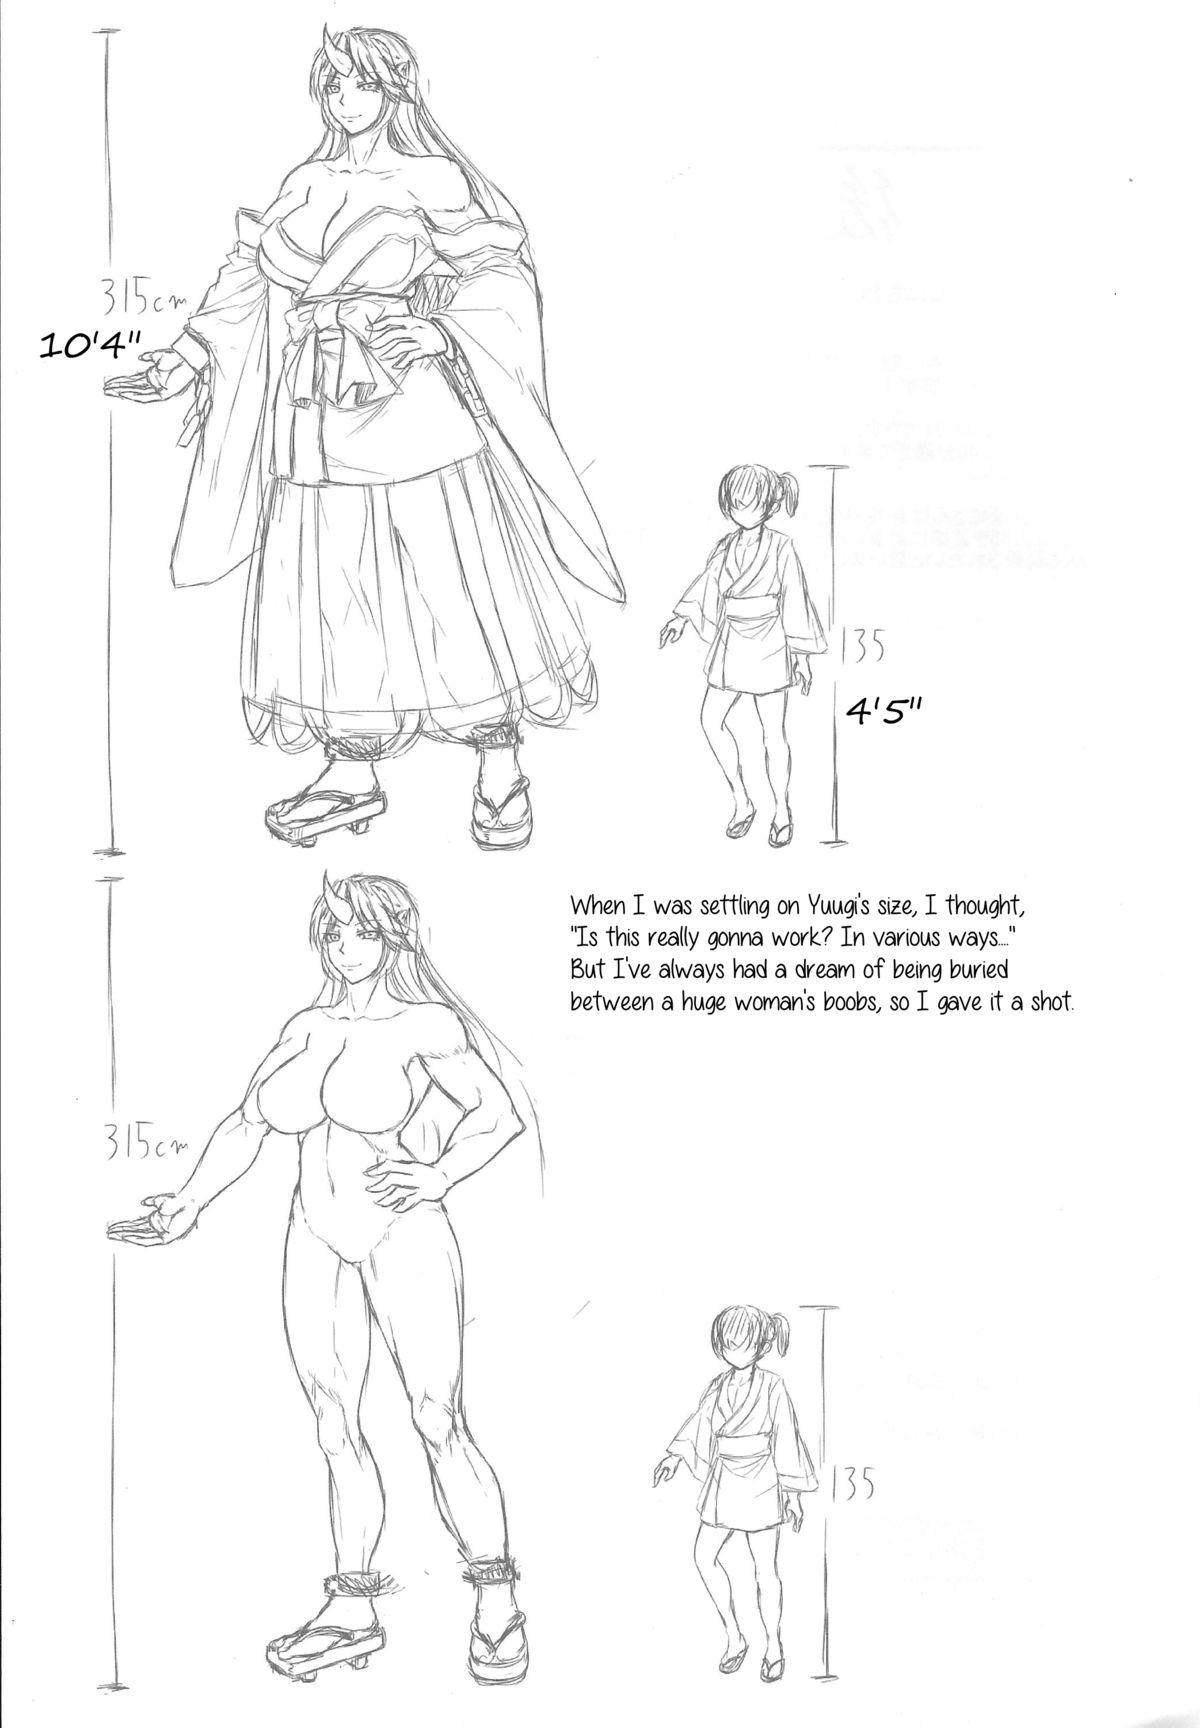 (Reitaisai 11) [Nanakorobi Yaoki (kinntarou)] 3M-Kyuu no Yuugi Nee-san ga Osotte Kitazo! | Attack of the 3M-Class Yuugi! (Touhou Project) [English] {JUSTICE} 23